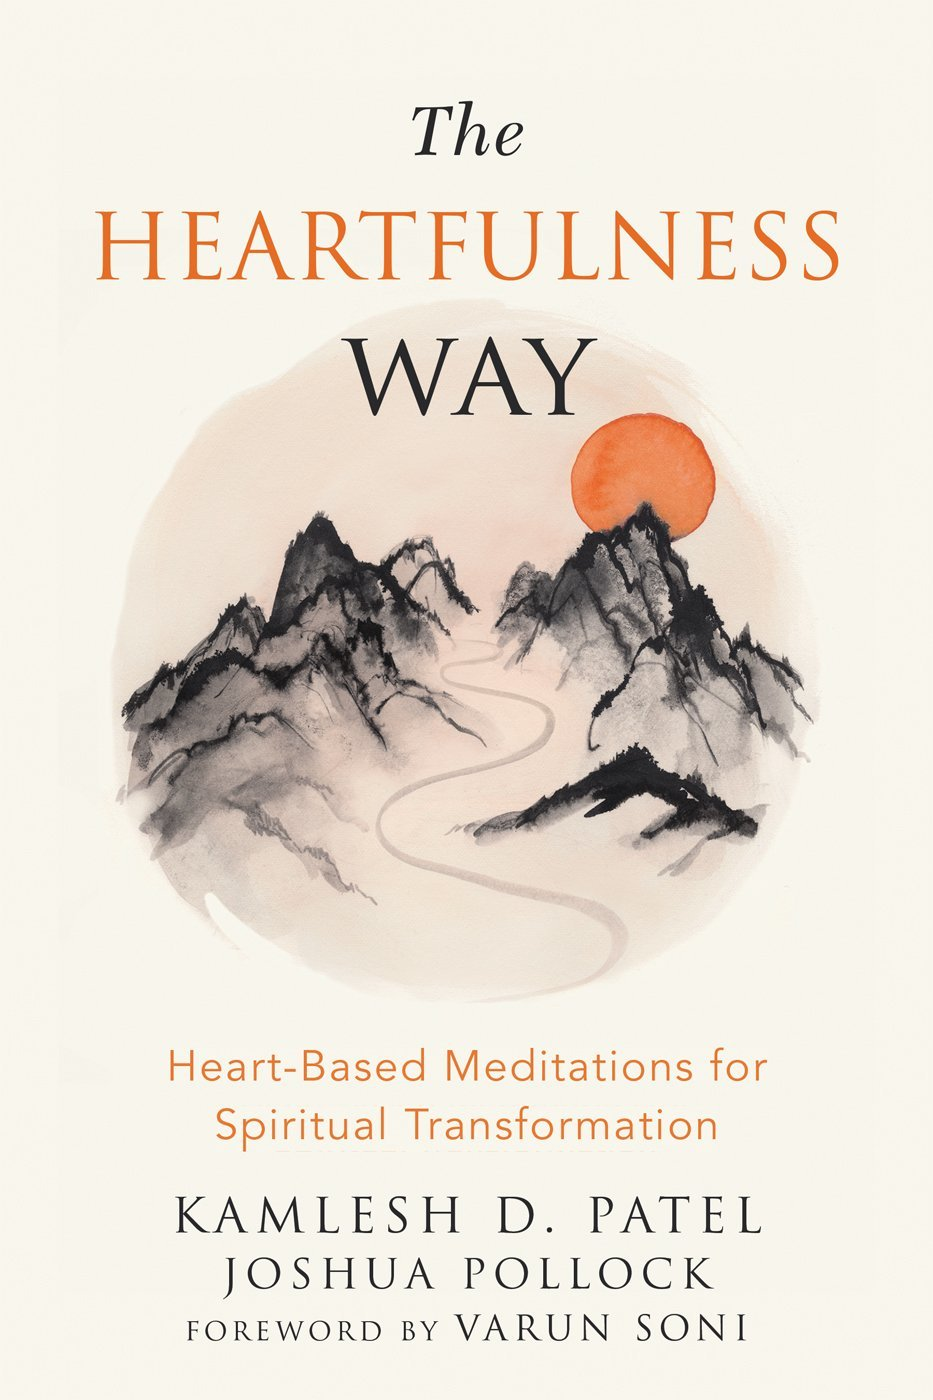 The Heartfulness Way Heart-Based Meditations for Spiritual Transformation